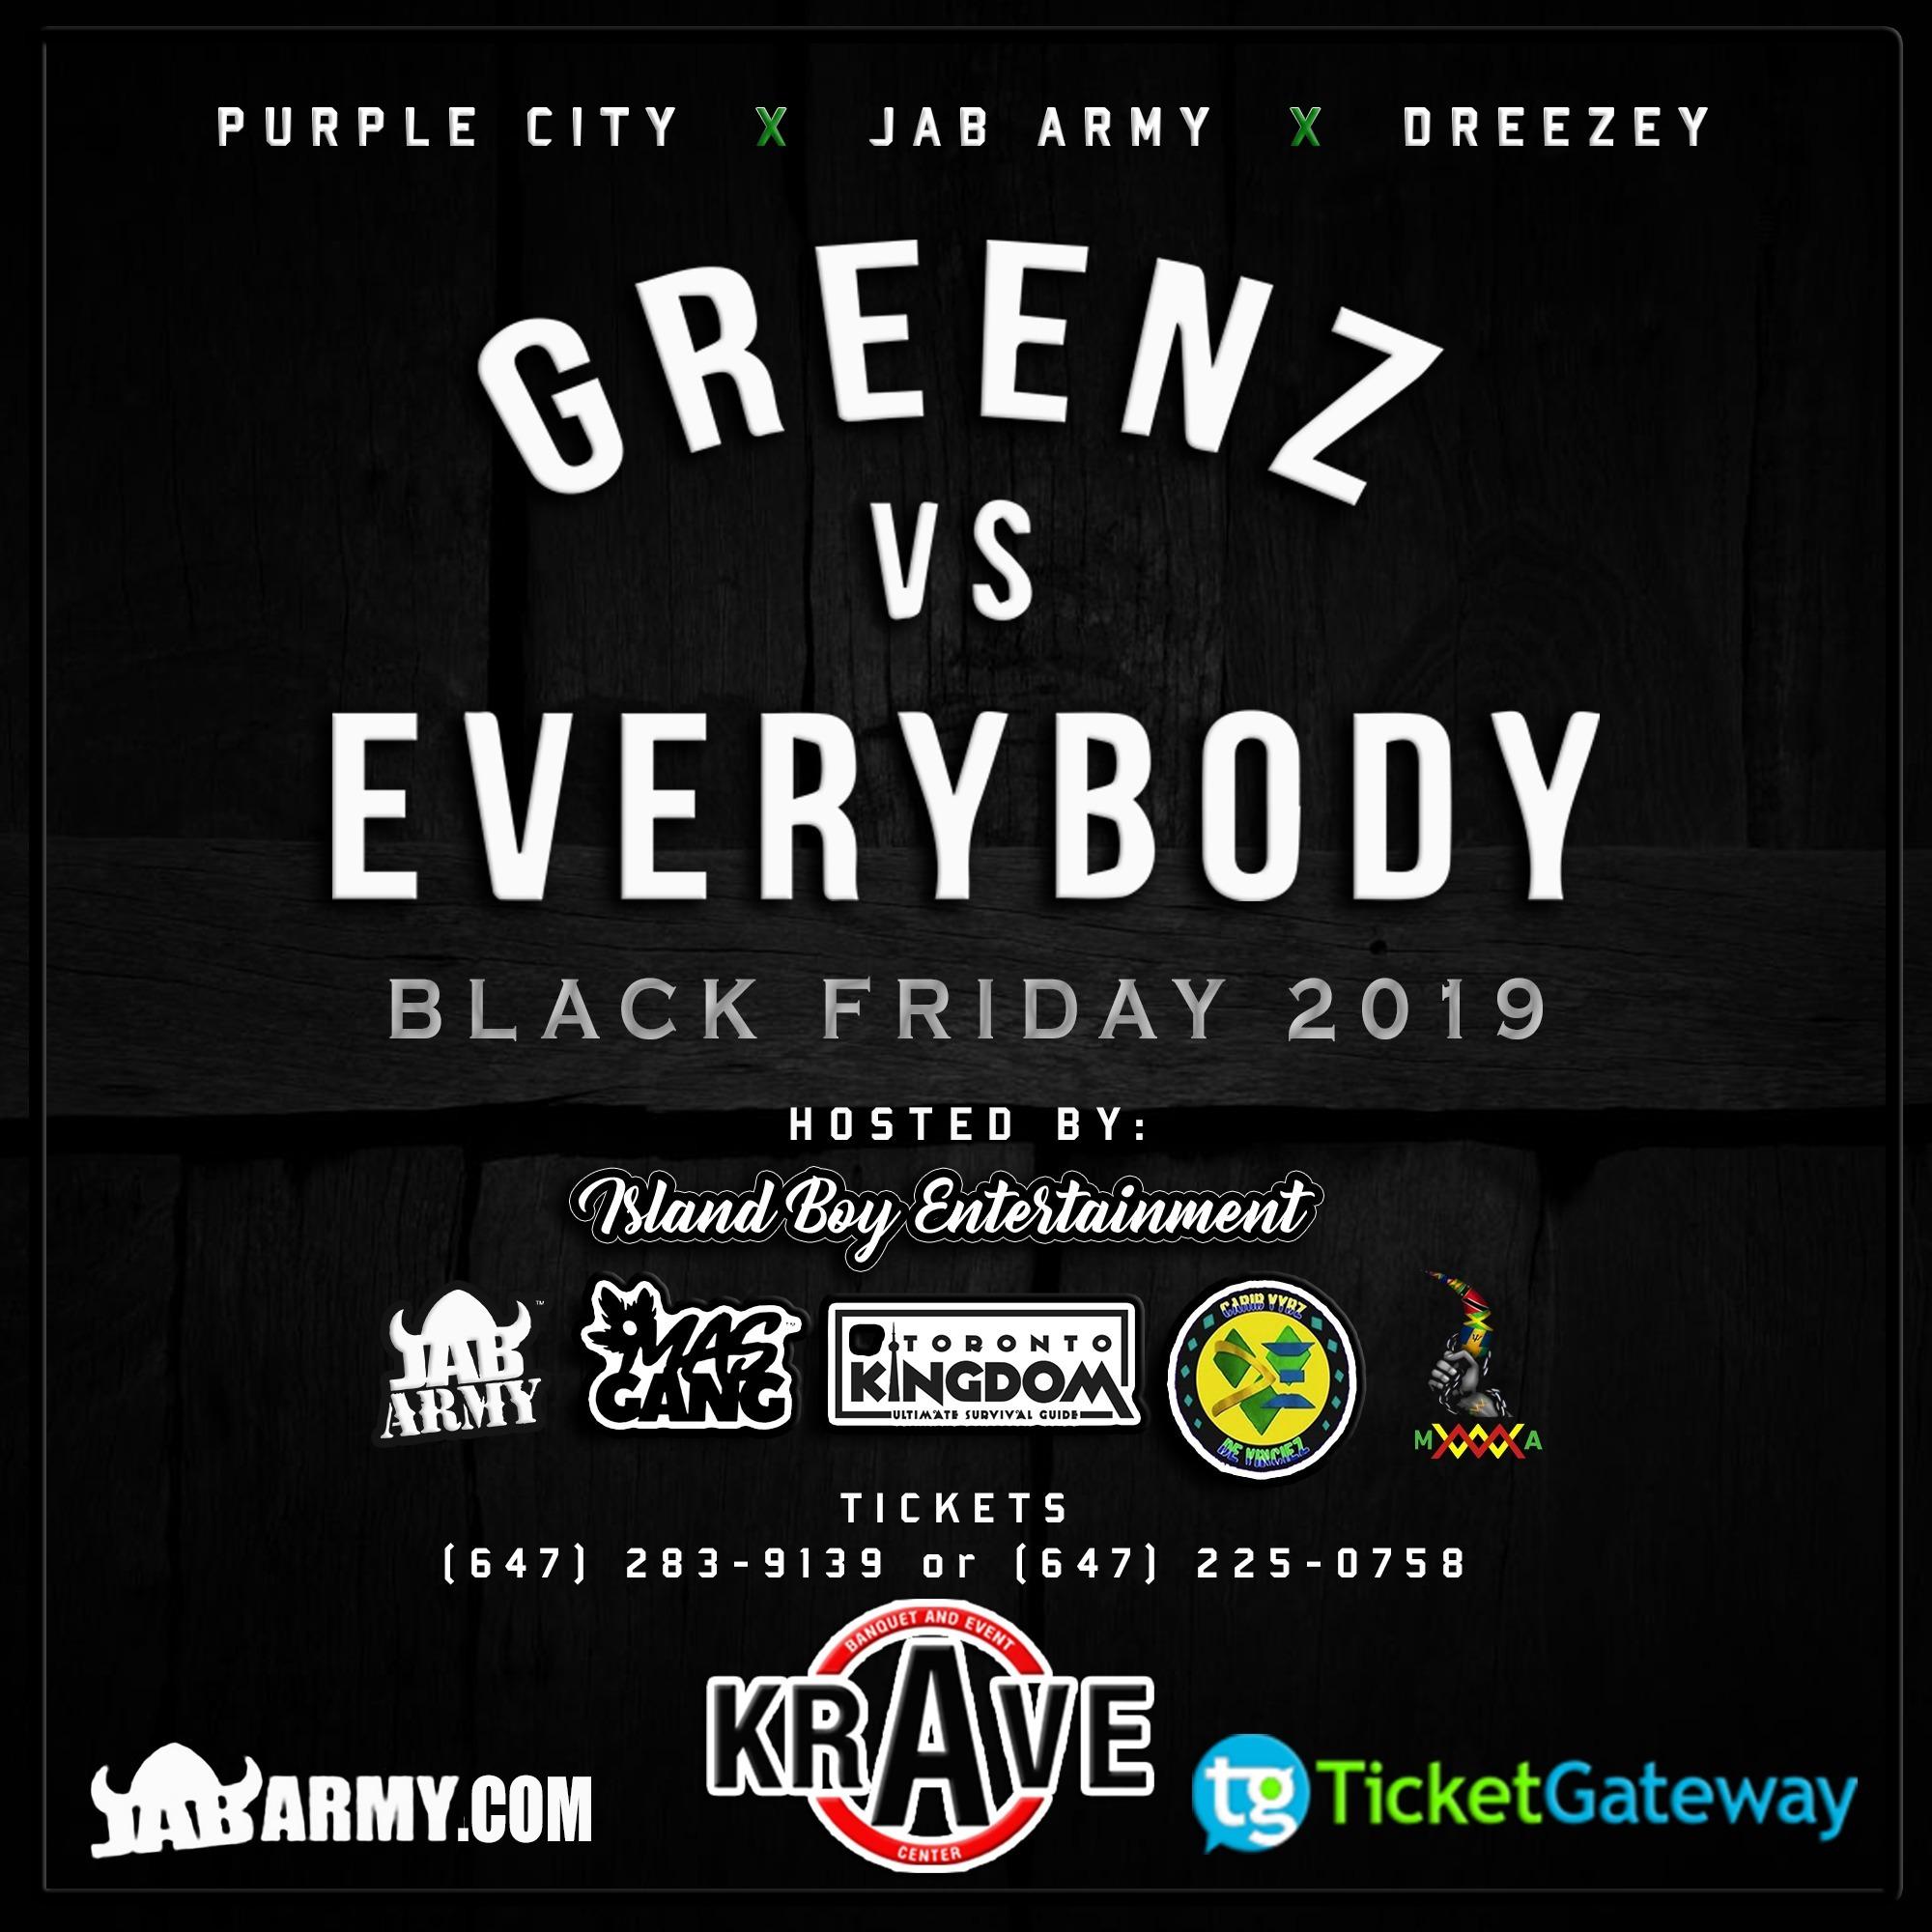 Greenz Vs Everybody @ Krave